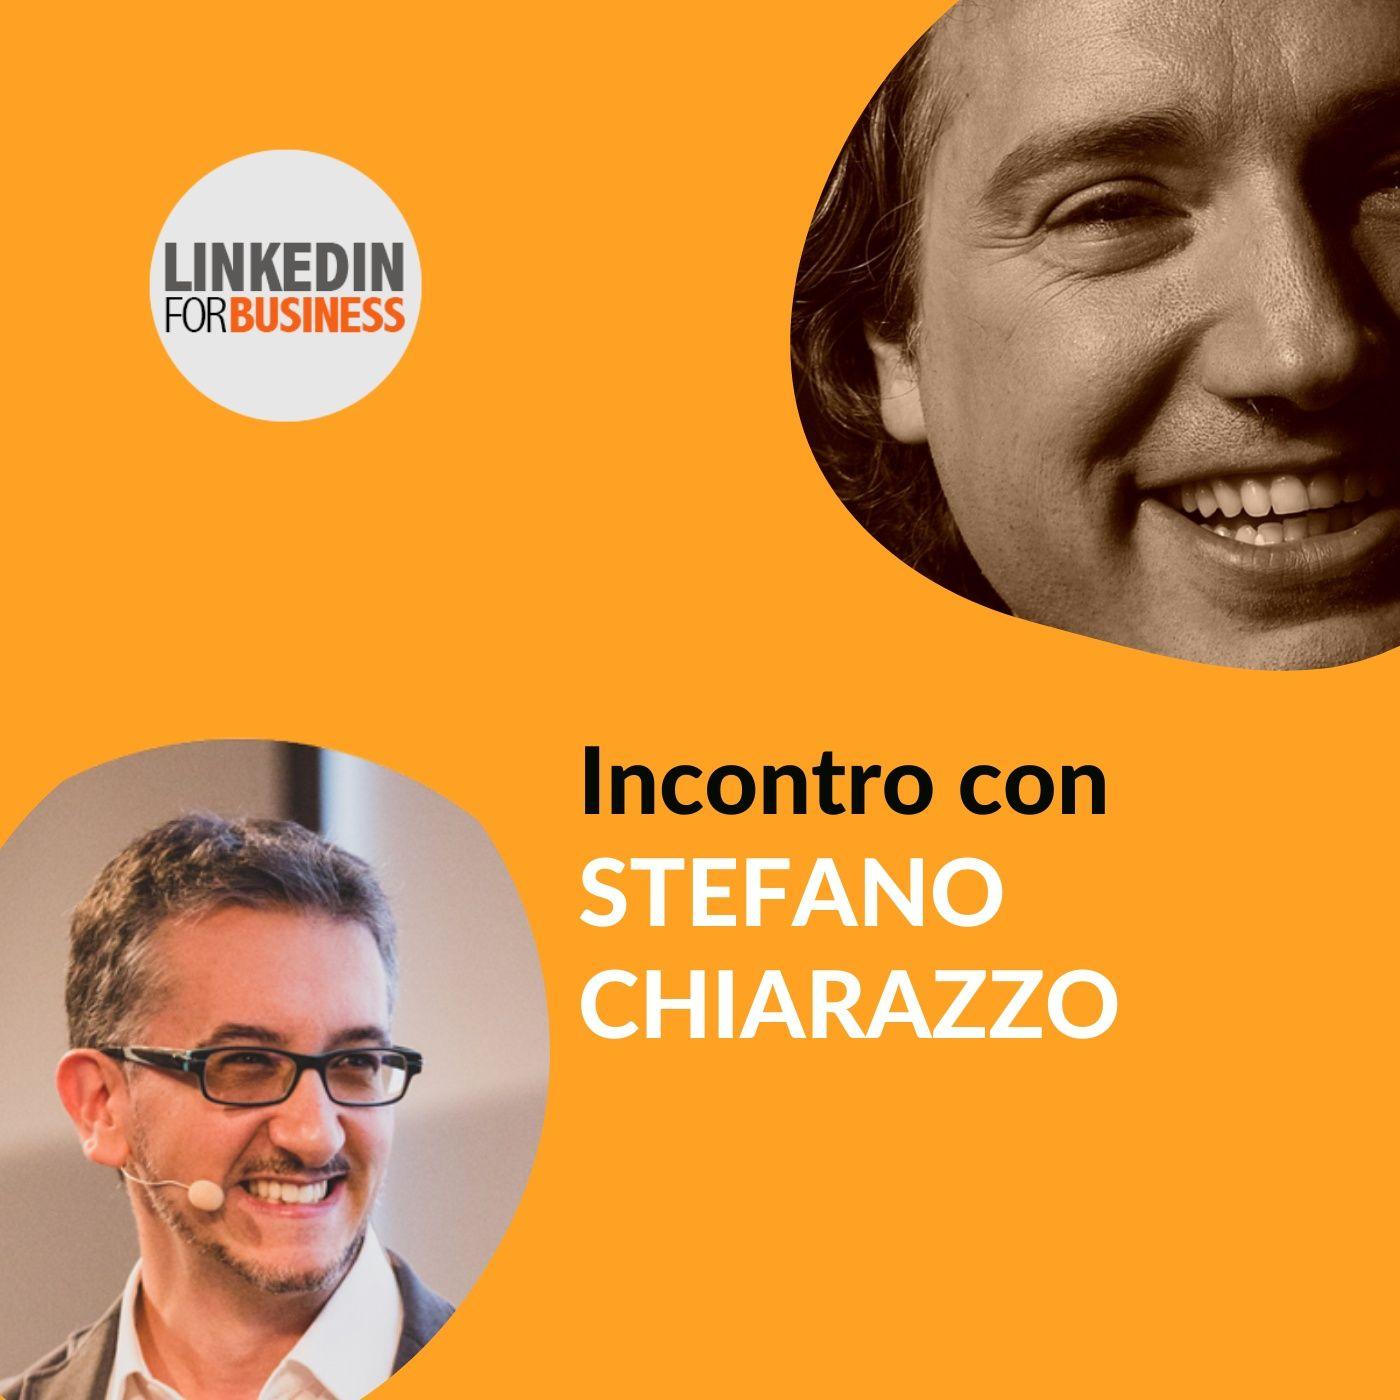 128 - LinkedInForBusiness incontra Stefano Chiarazzo